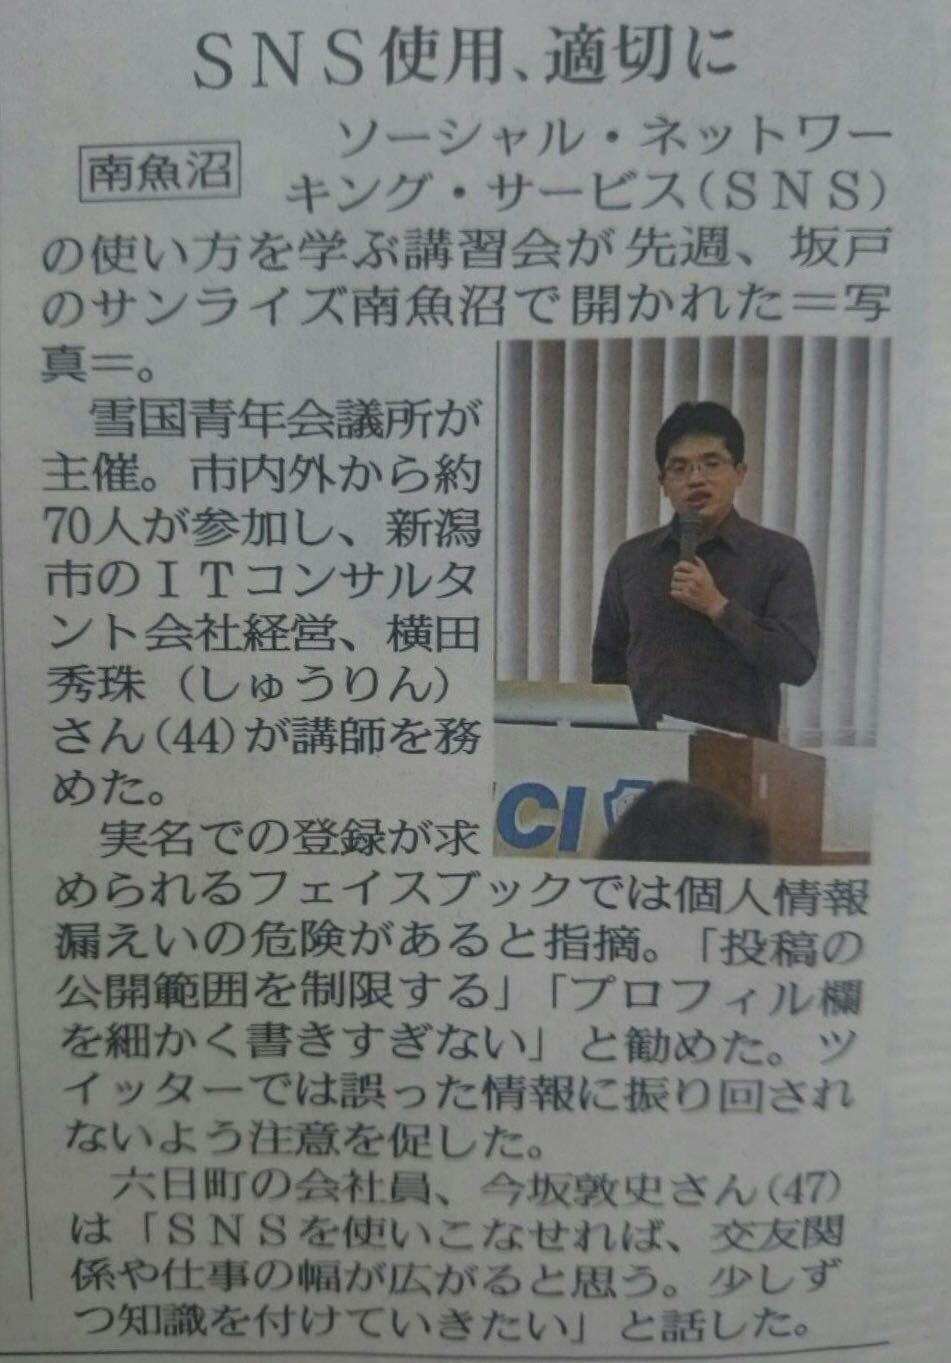 #雪国青年会議所 http://yokotashurin.com/sns/exif.html